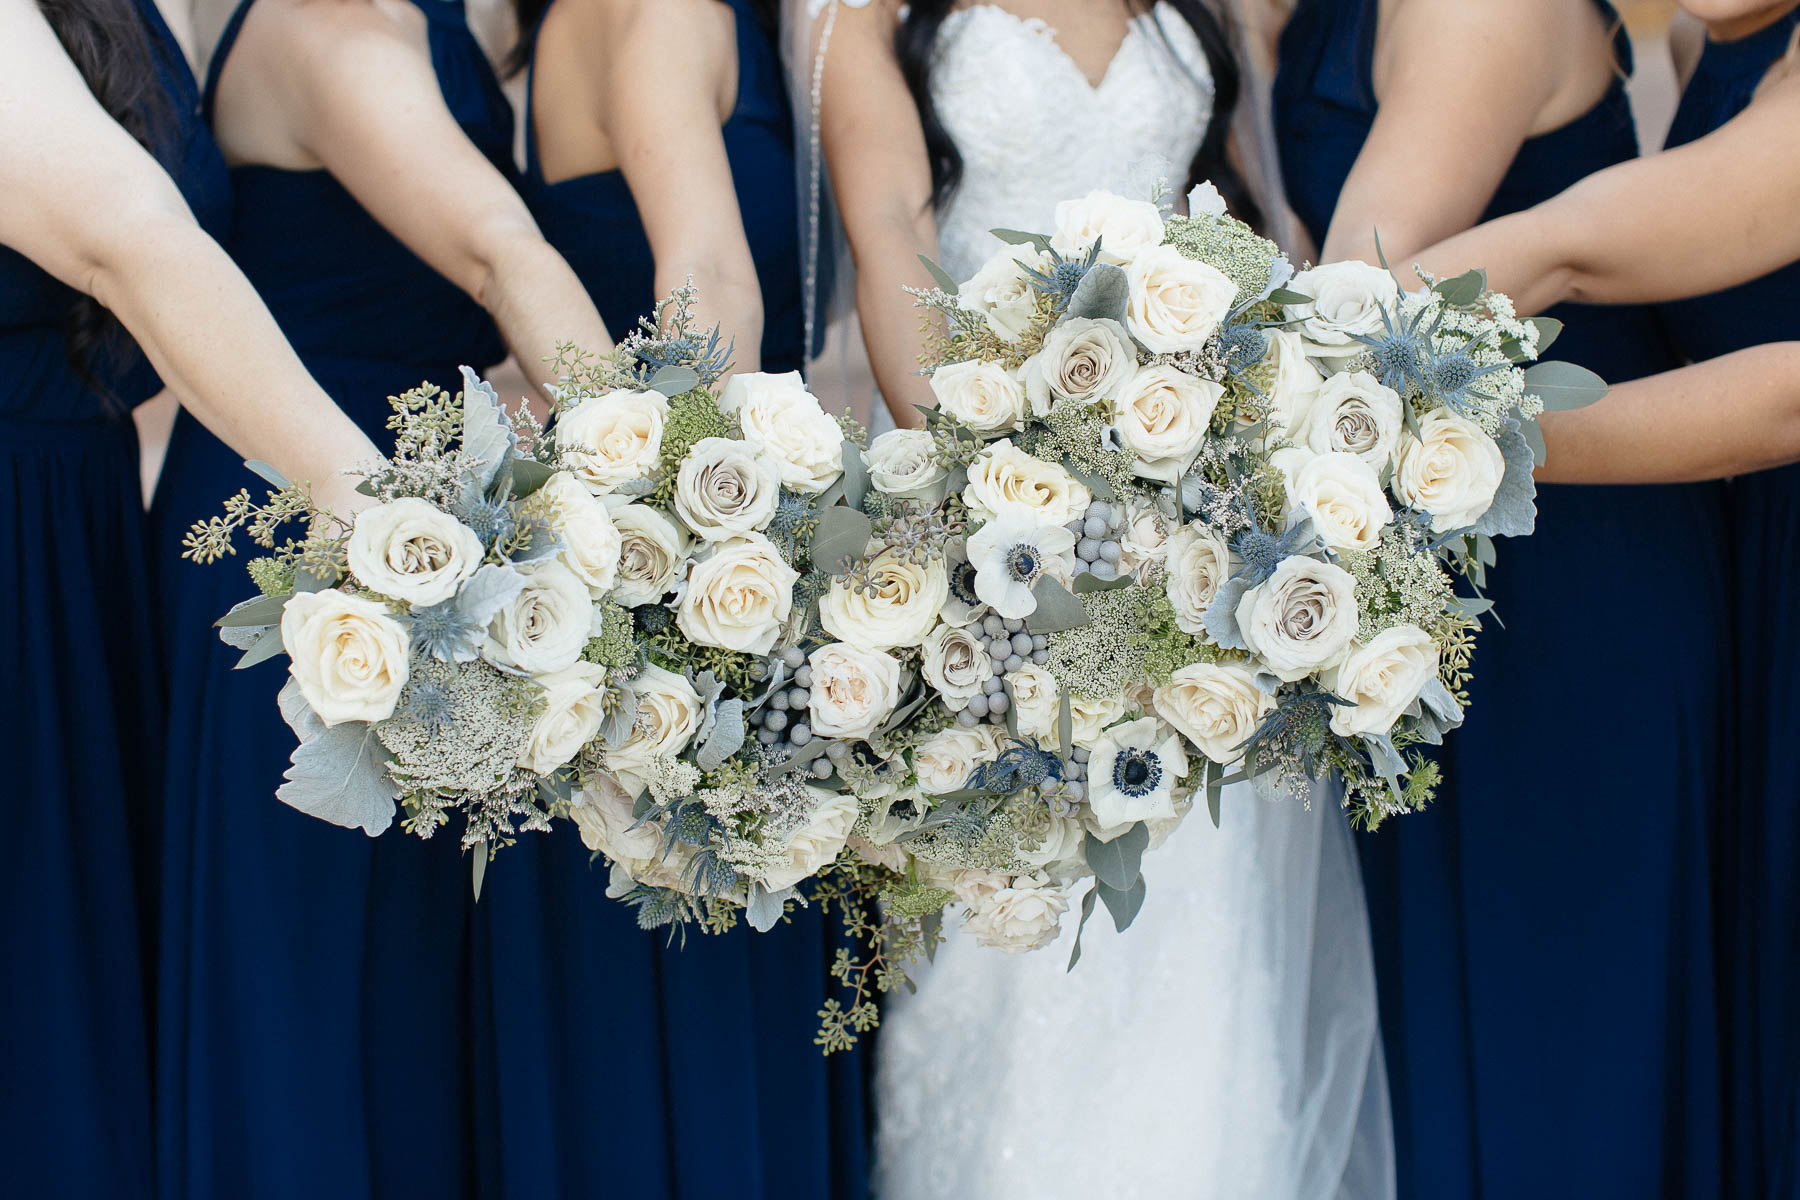 161029-Luxium-Weddings-Arizona-Jeff-Griselda-First-Look-Val-Vista-Lakes-Gilber-048.jpg